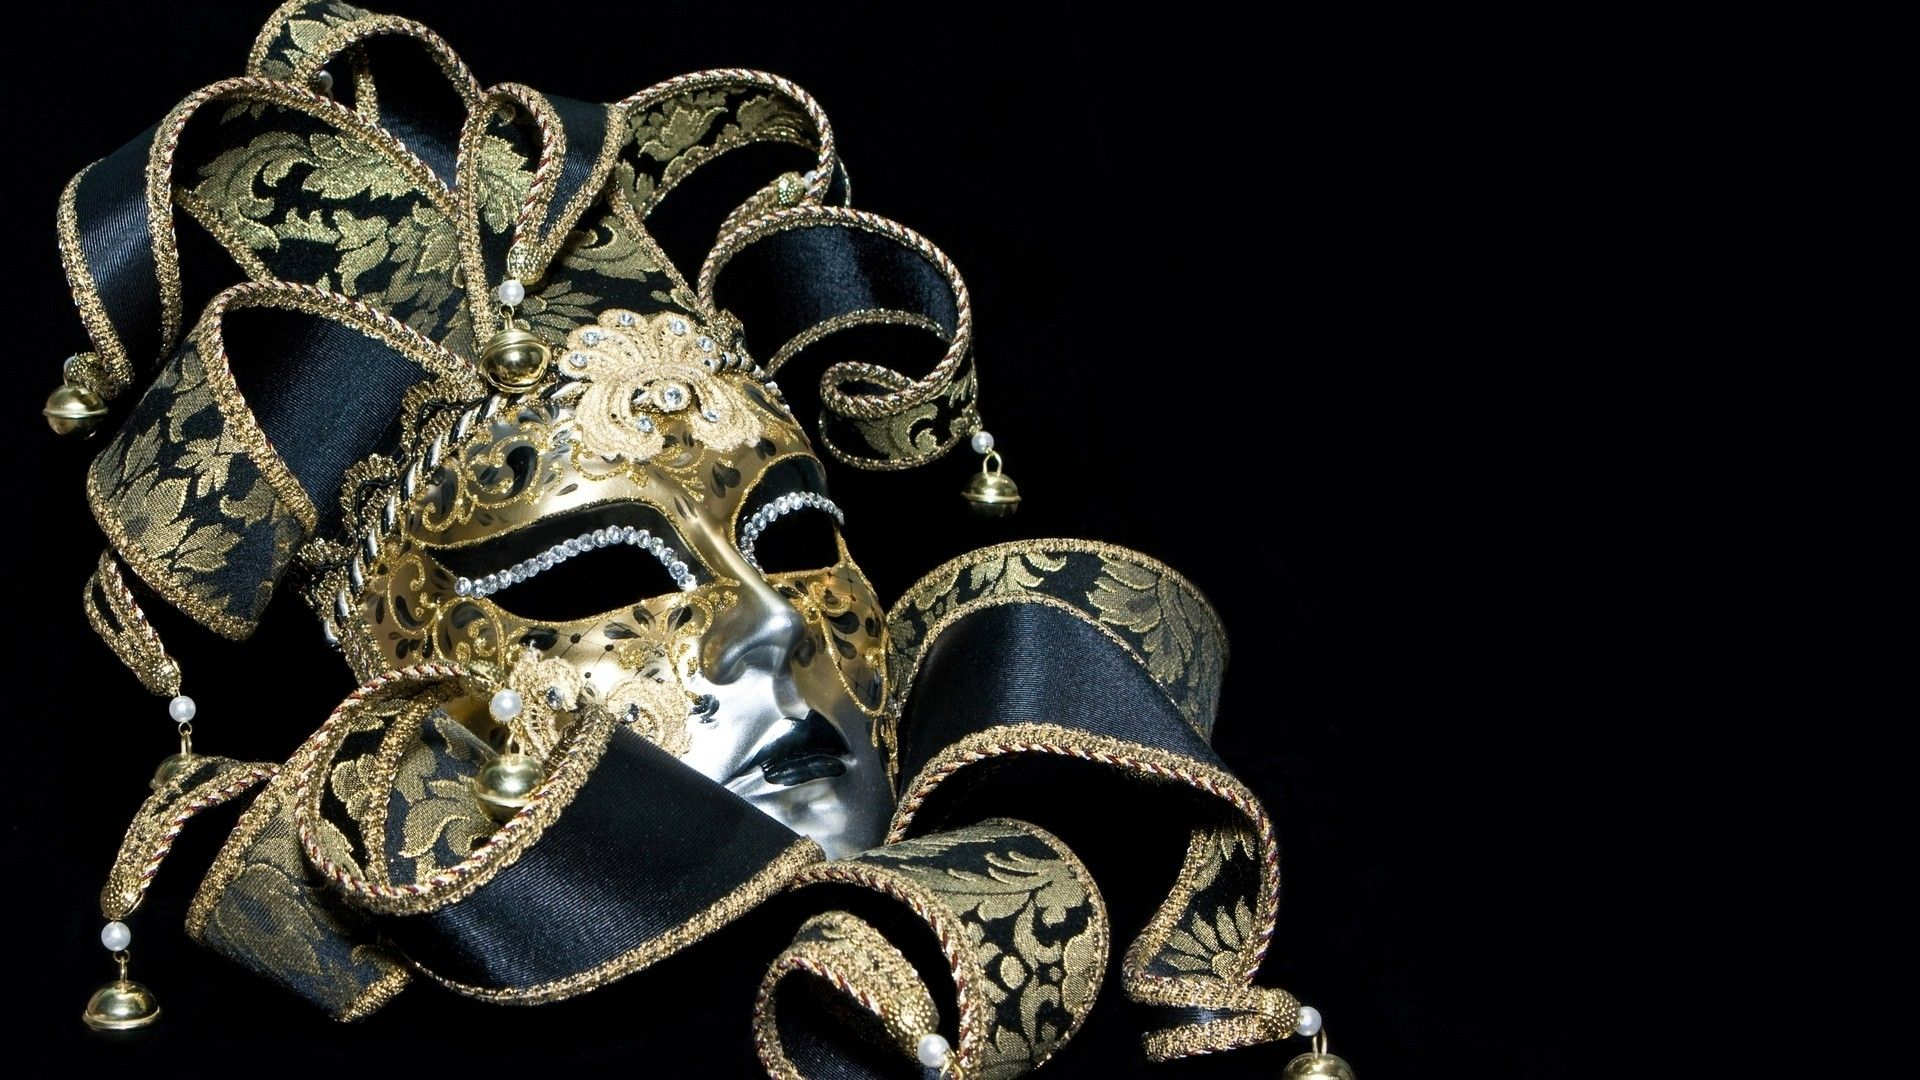 masqurede masks | Mask, Masquerade wallpapers | Isabetta ...